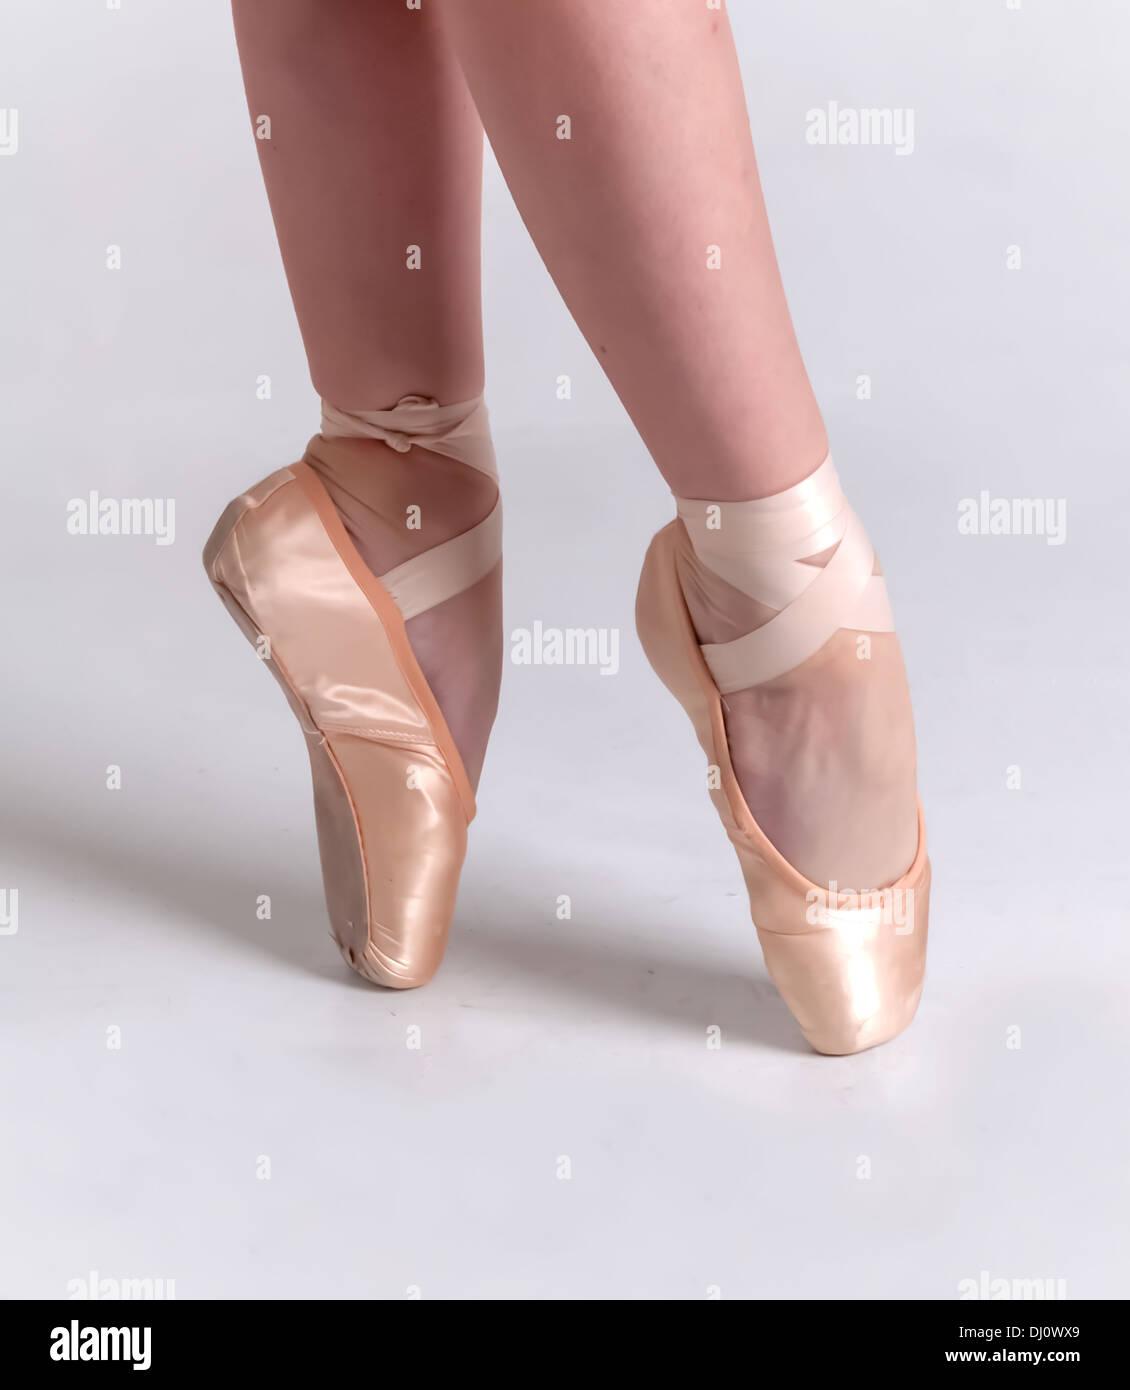 Ballerina Performing Pointe Work - Stock Image